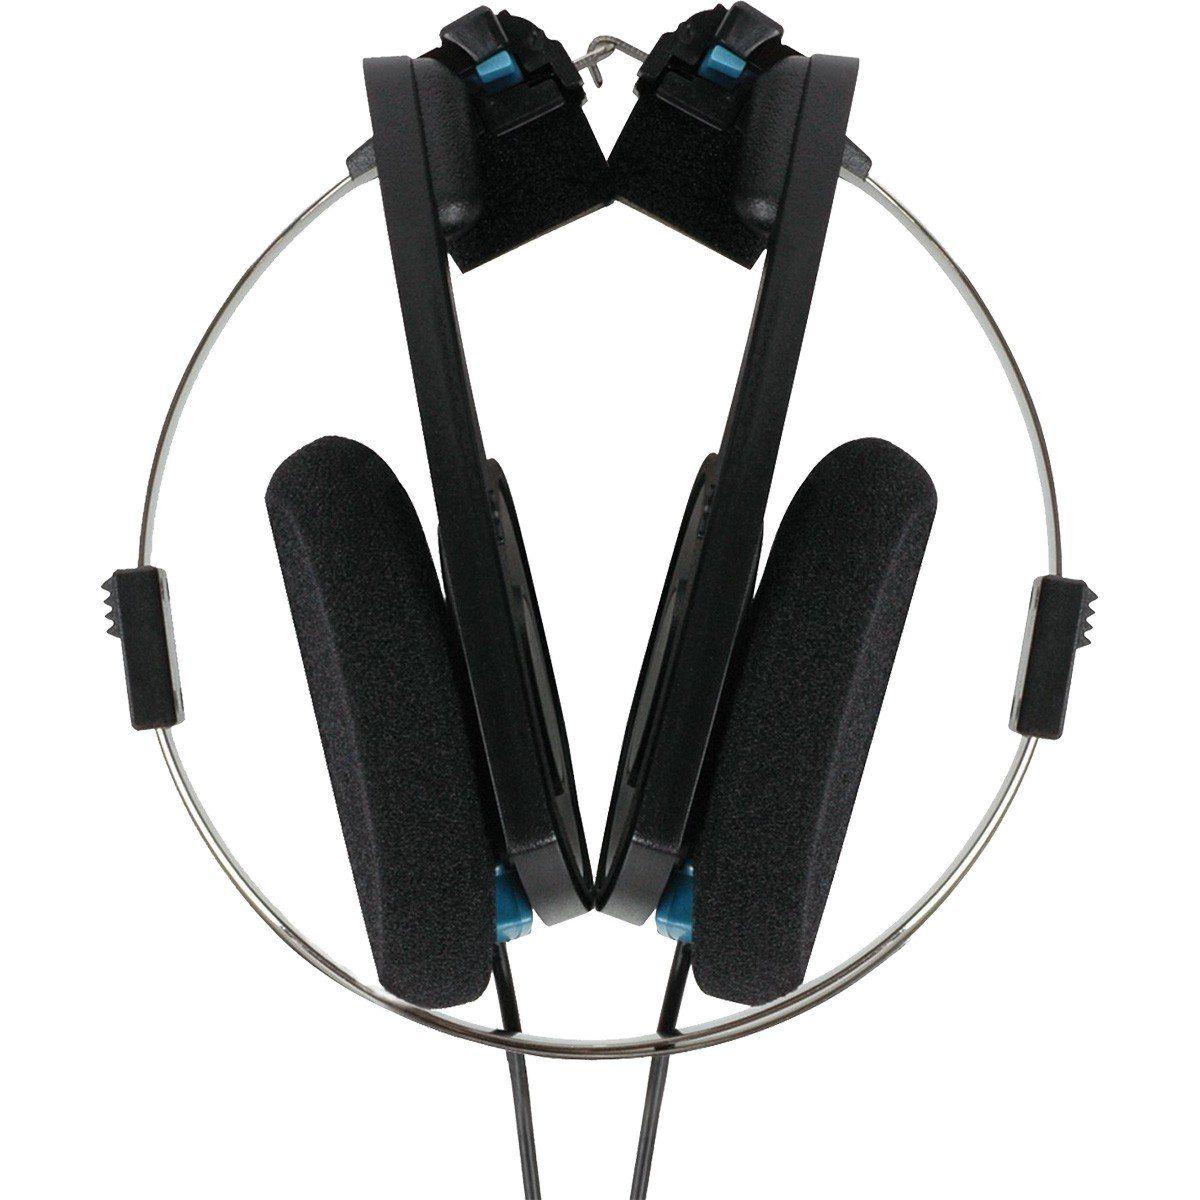 Koss Porta Pro Fone de Ouvido Porta-Pro Original Semi-Aberto para Retorno